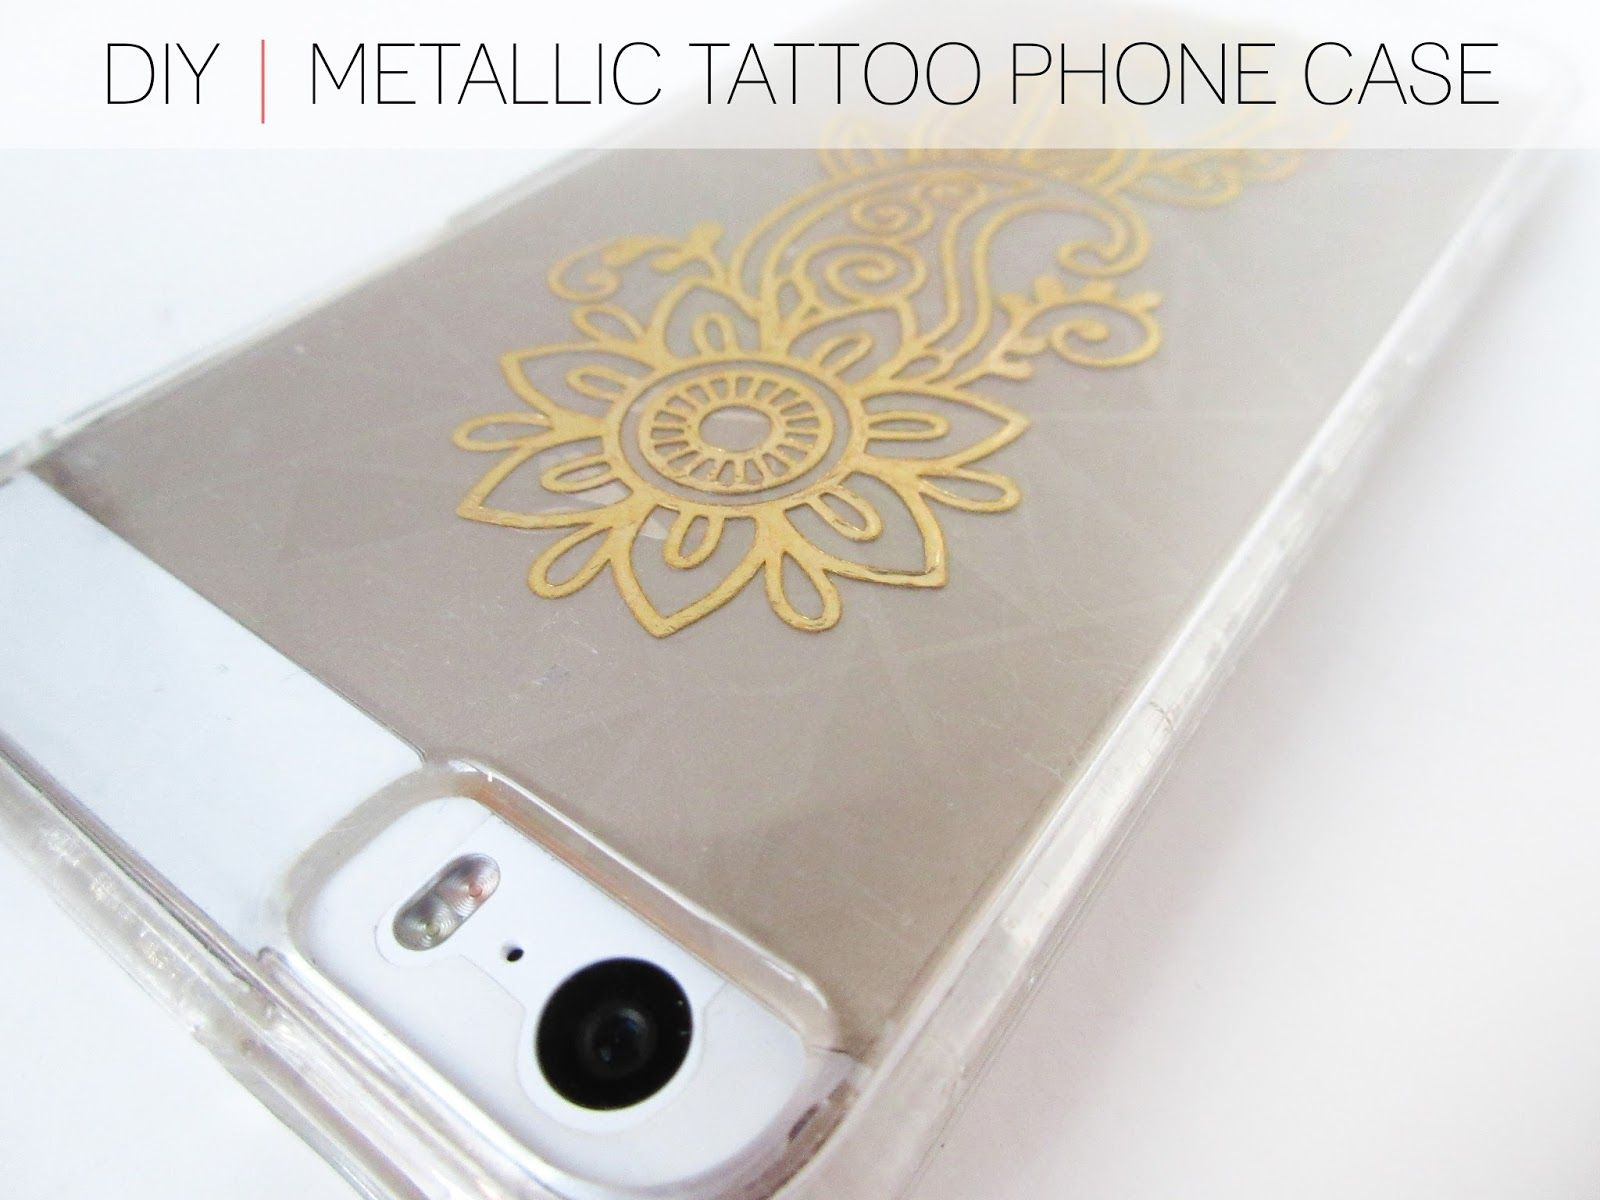 cafe craftea: diy   metallic tattooed phone case   crafty ideas